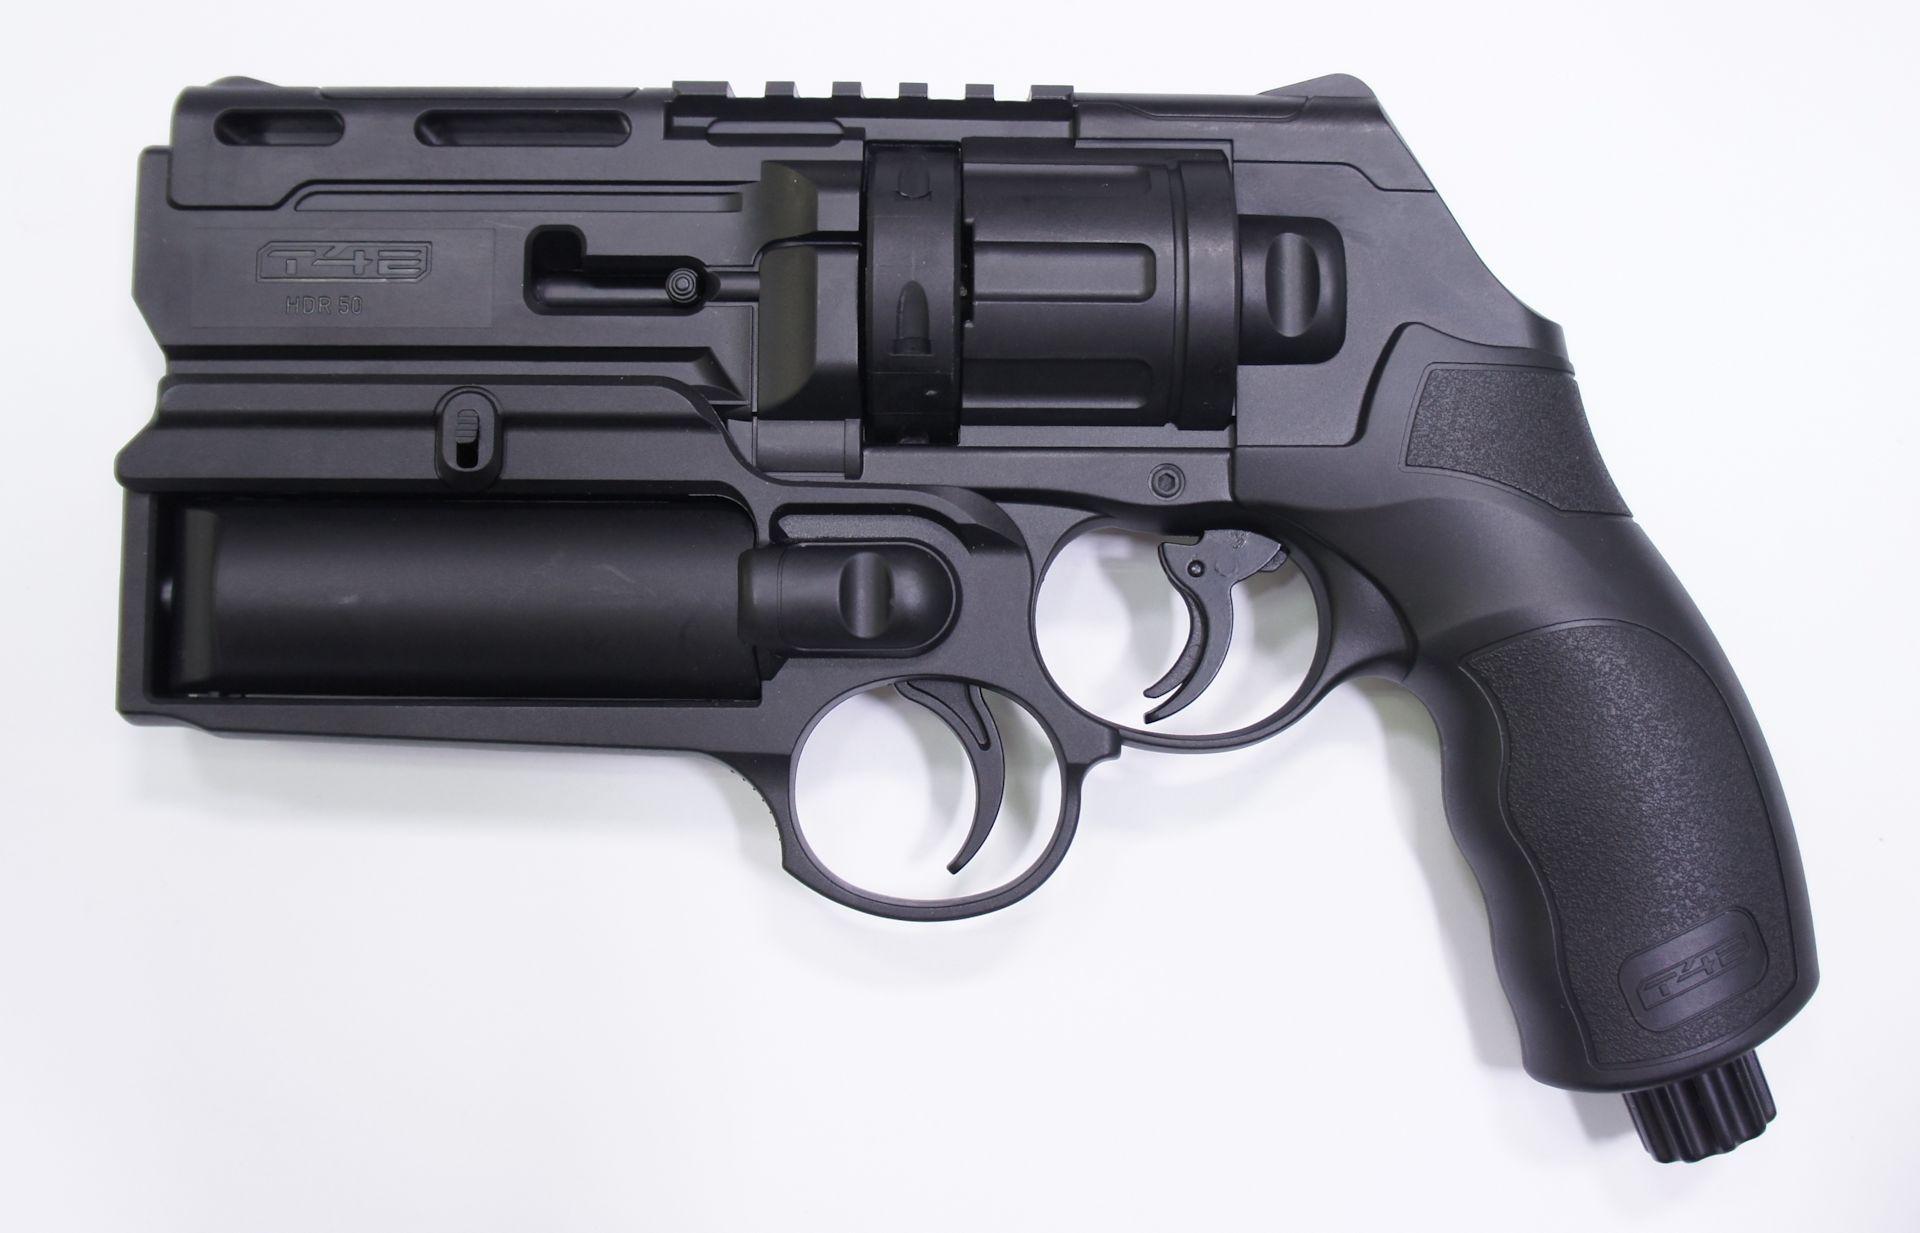 Dieses Gassprühgerät  passt perfeht an die Waffe HDR 50